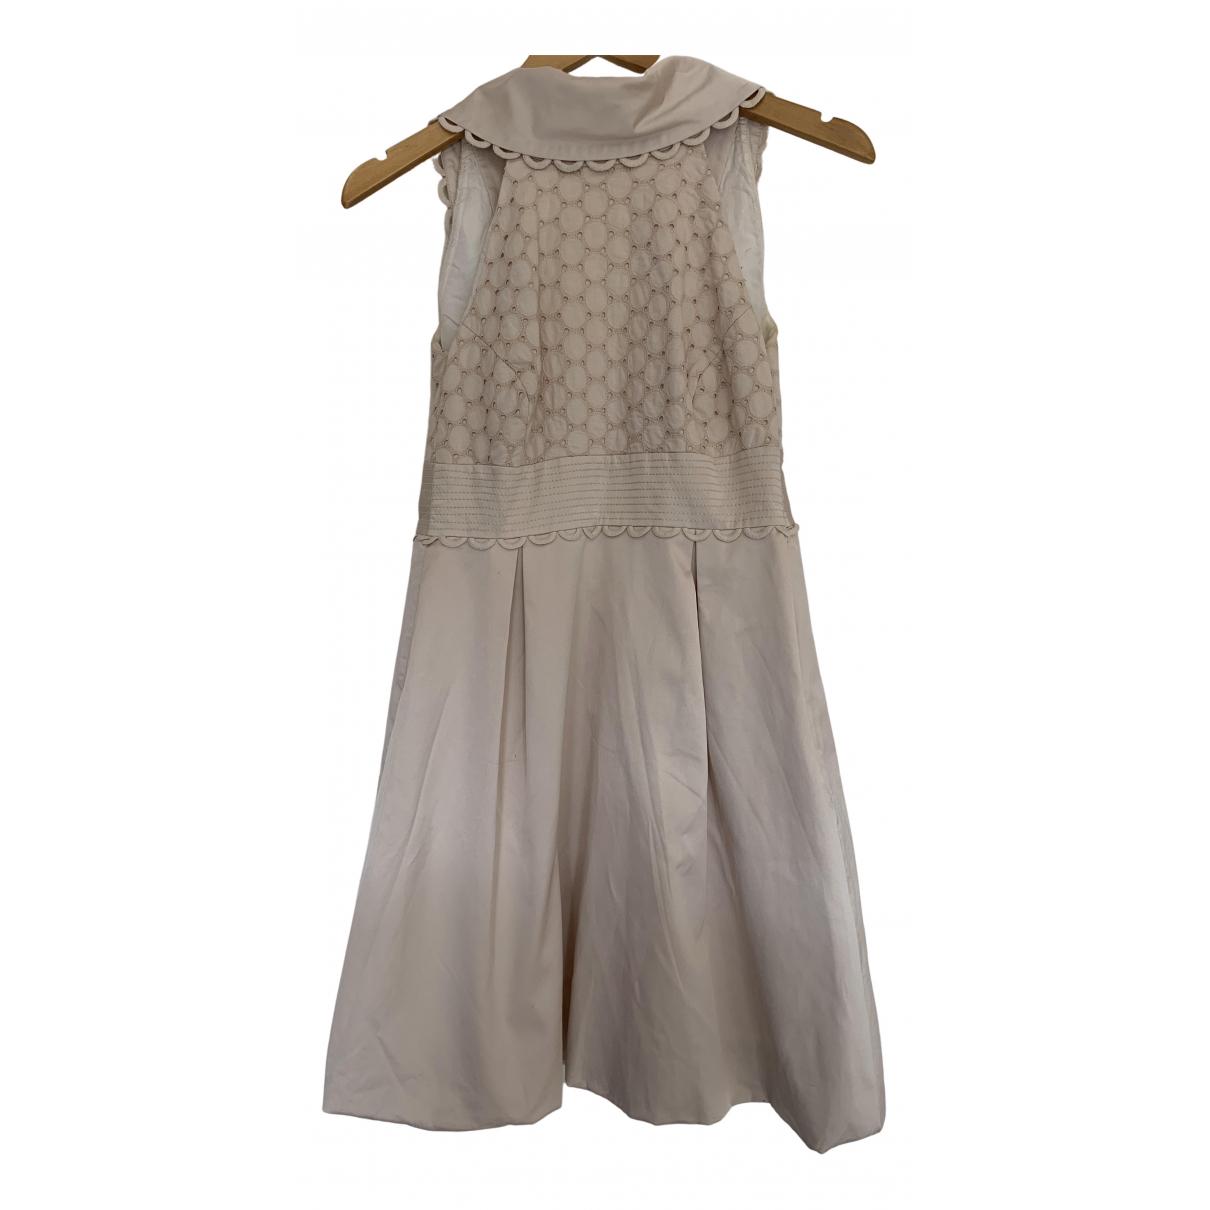 Karen Millen N Beige Cotton dress for Women 36 FR